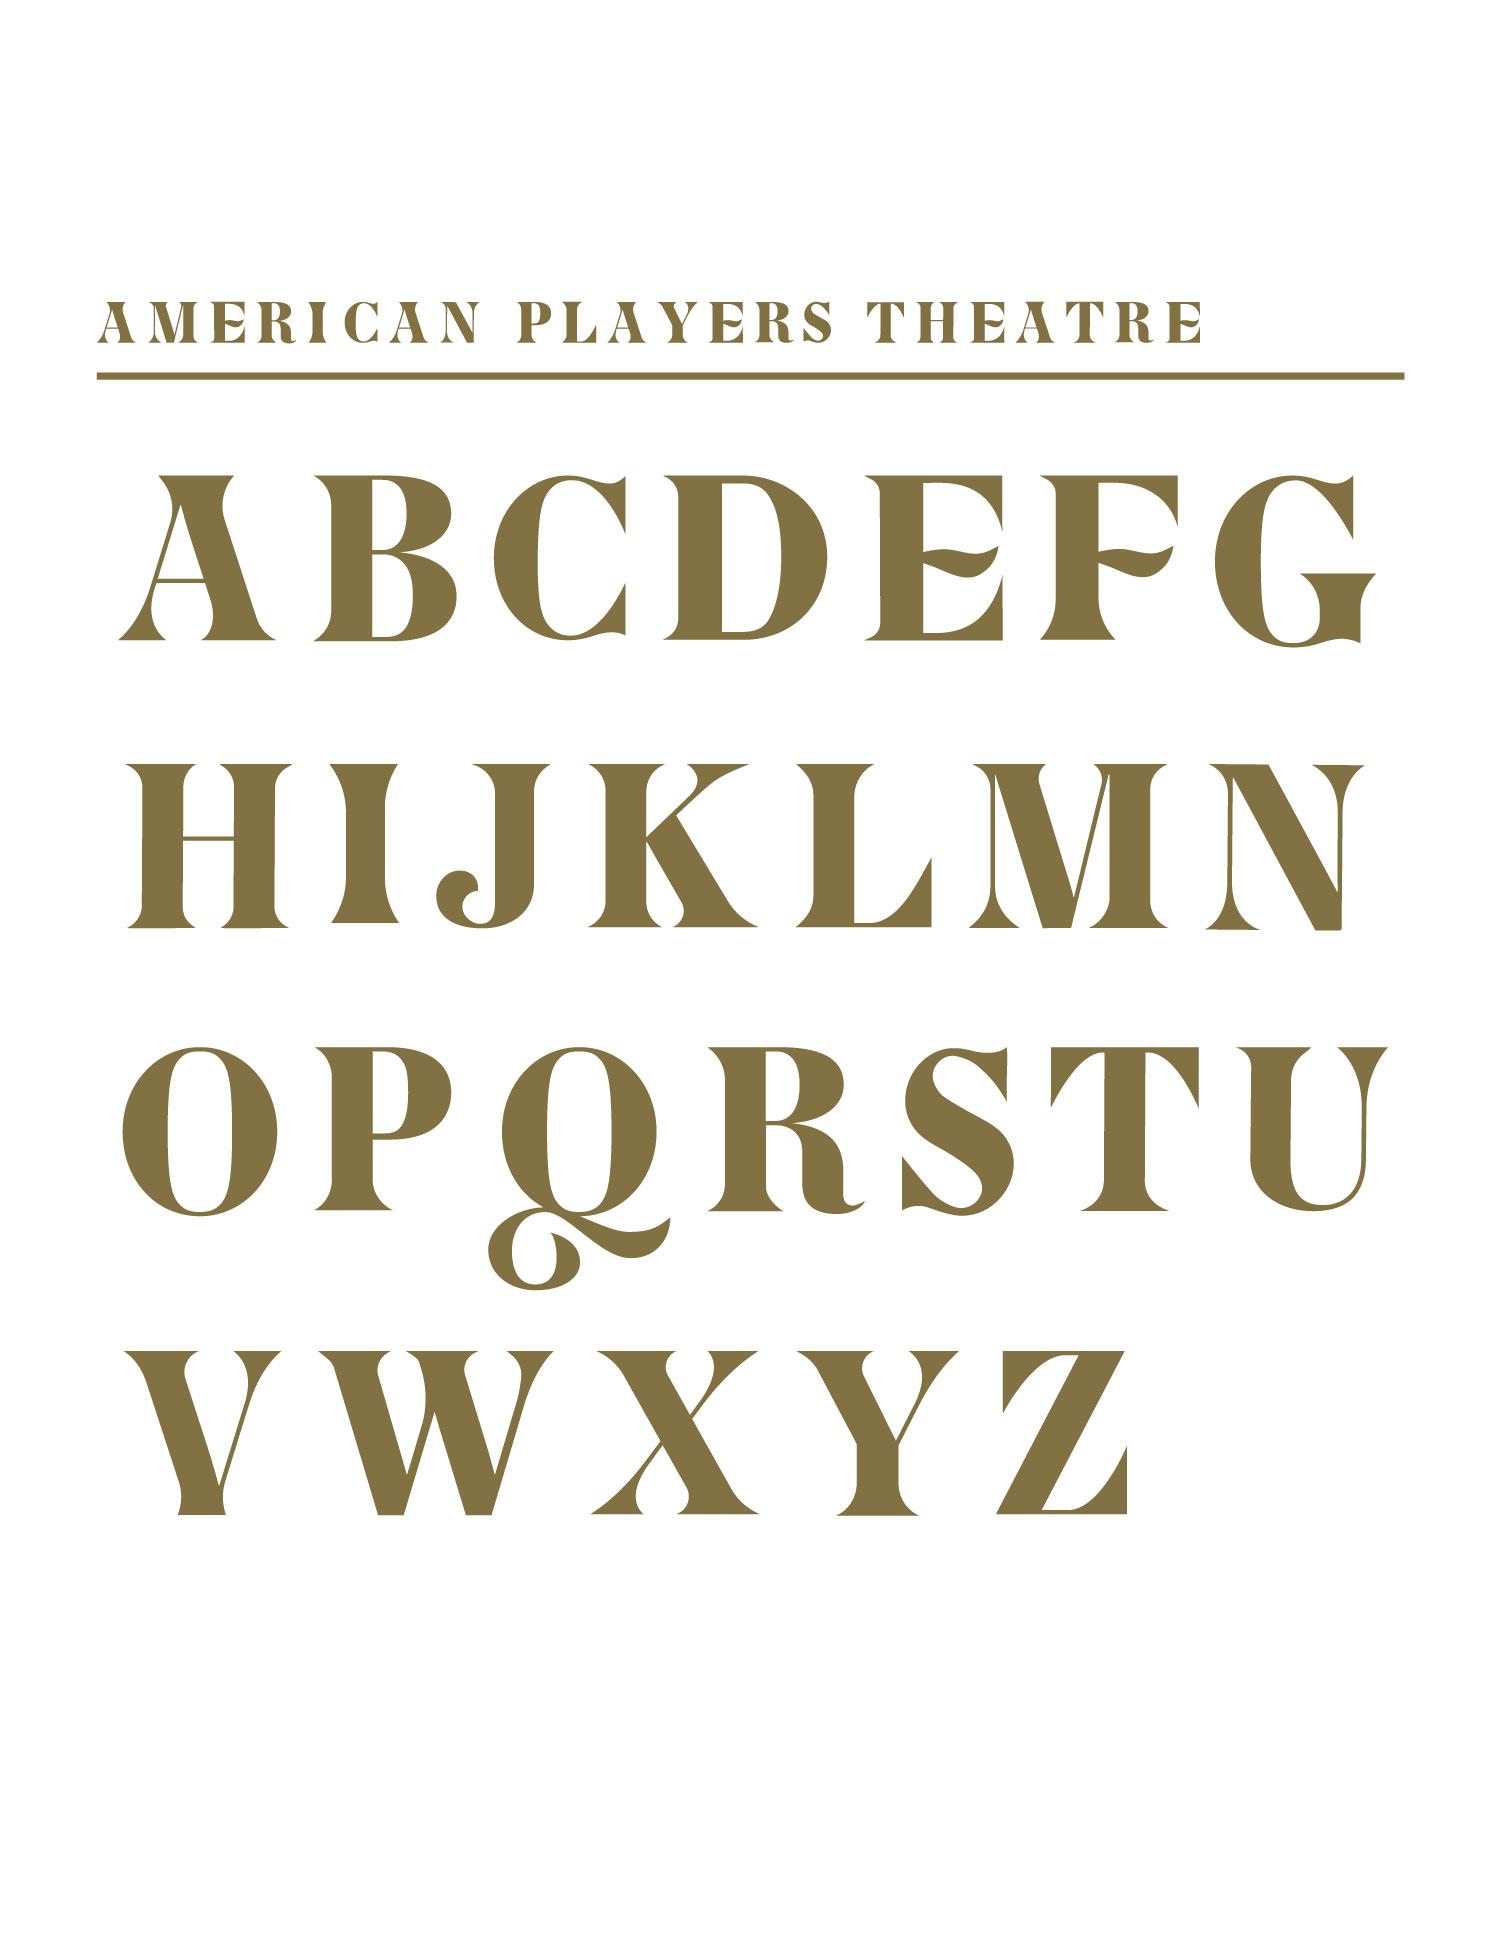 130-1600_APT-2017_font.jpg